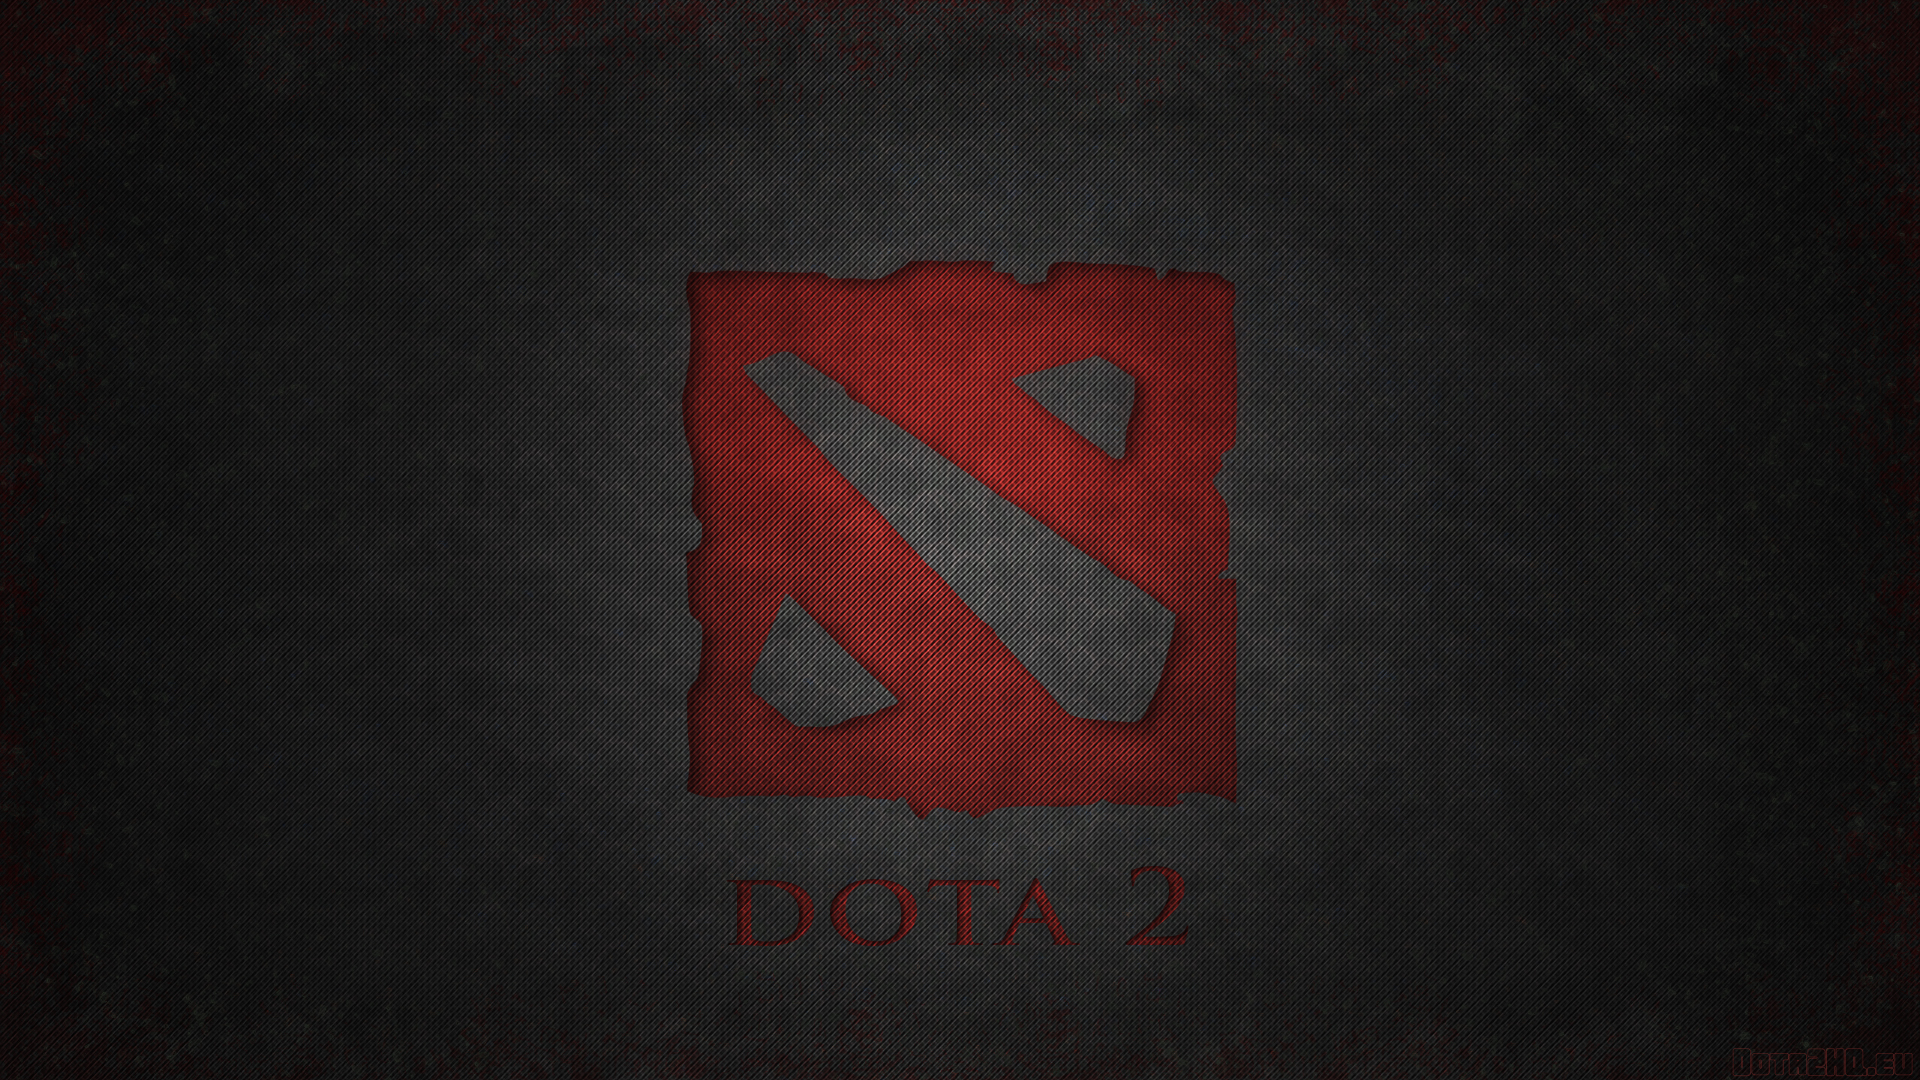 Dota 2 Logo Wallpapers Wallpaper Cave